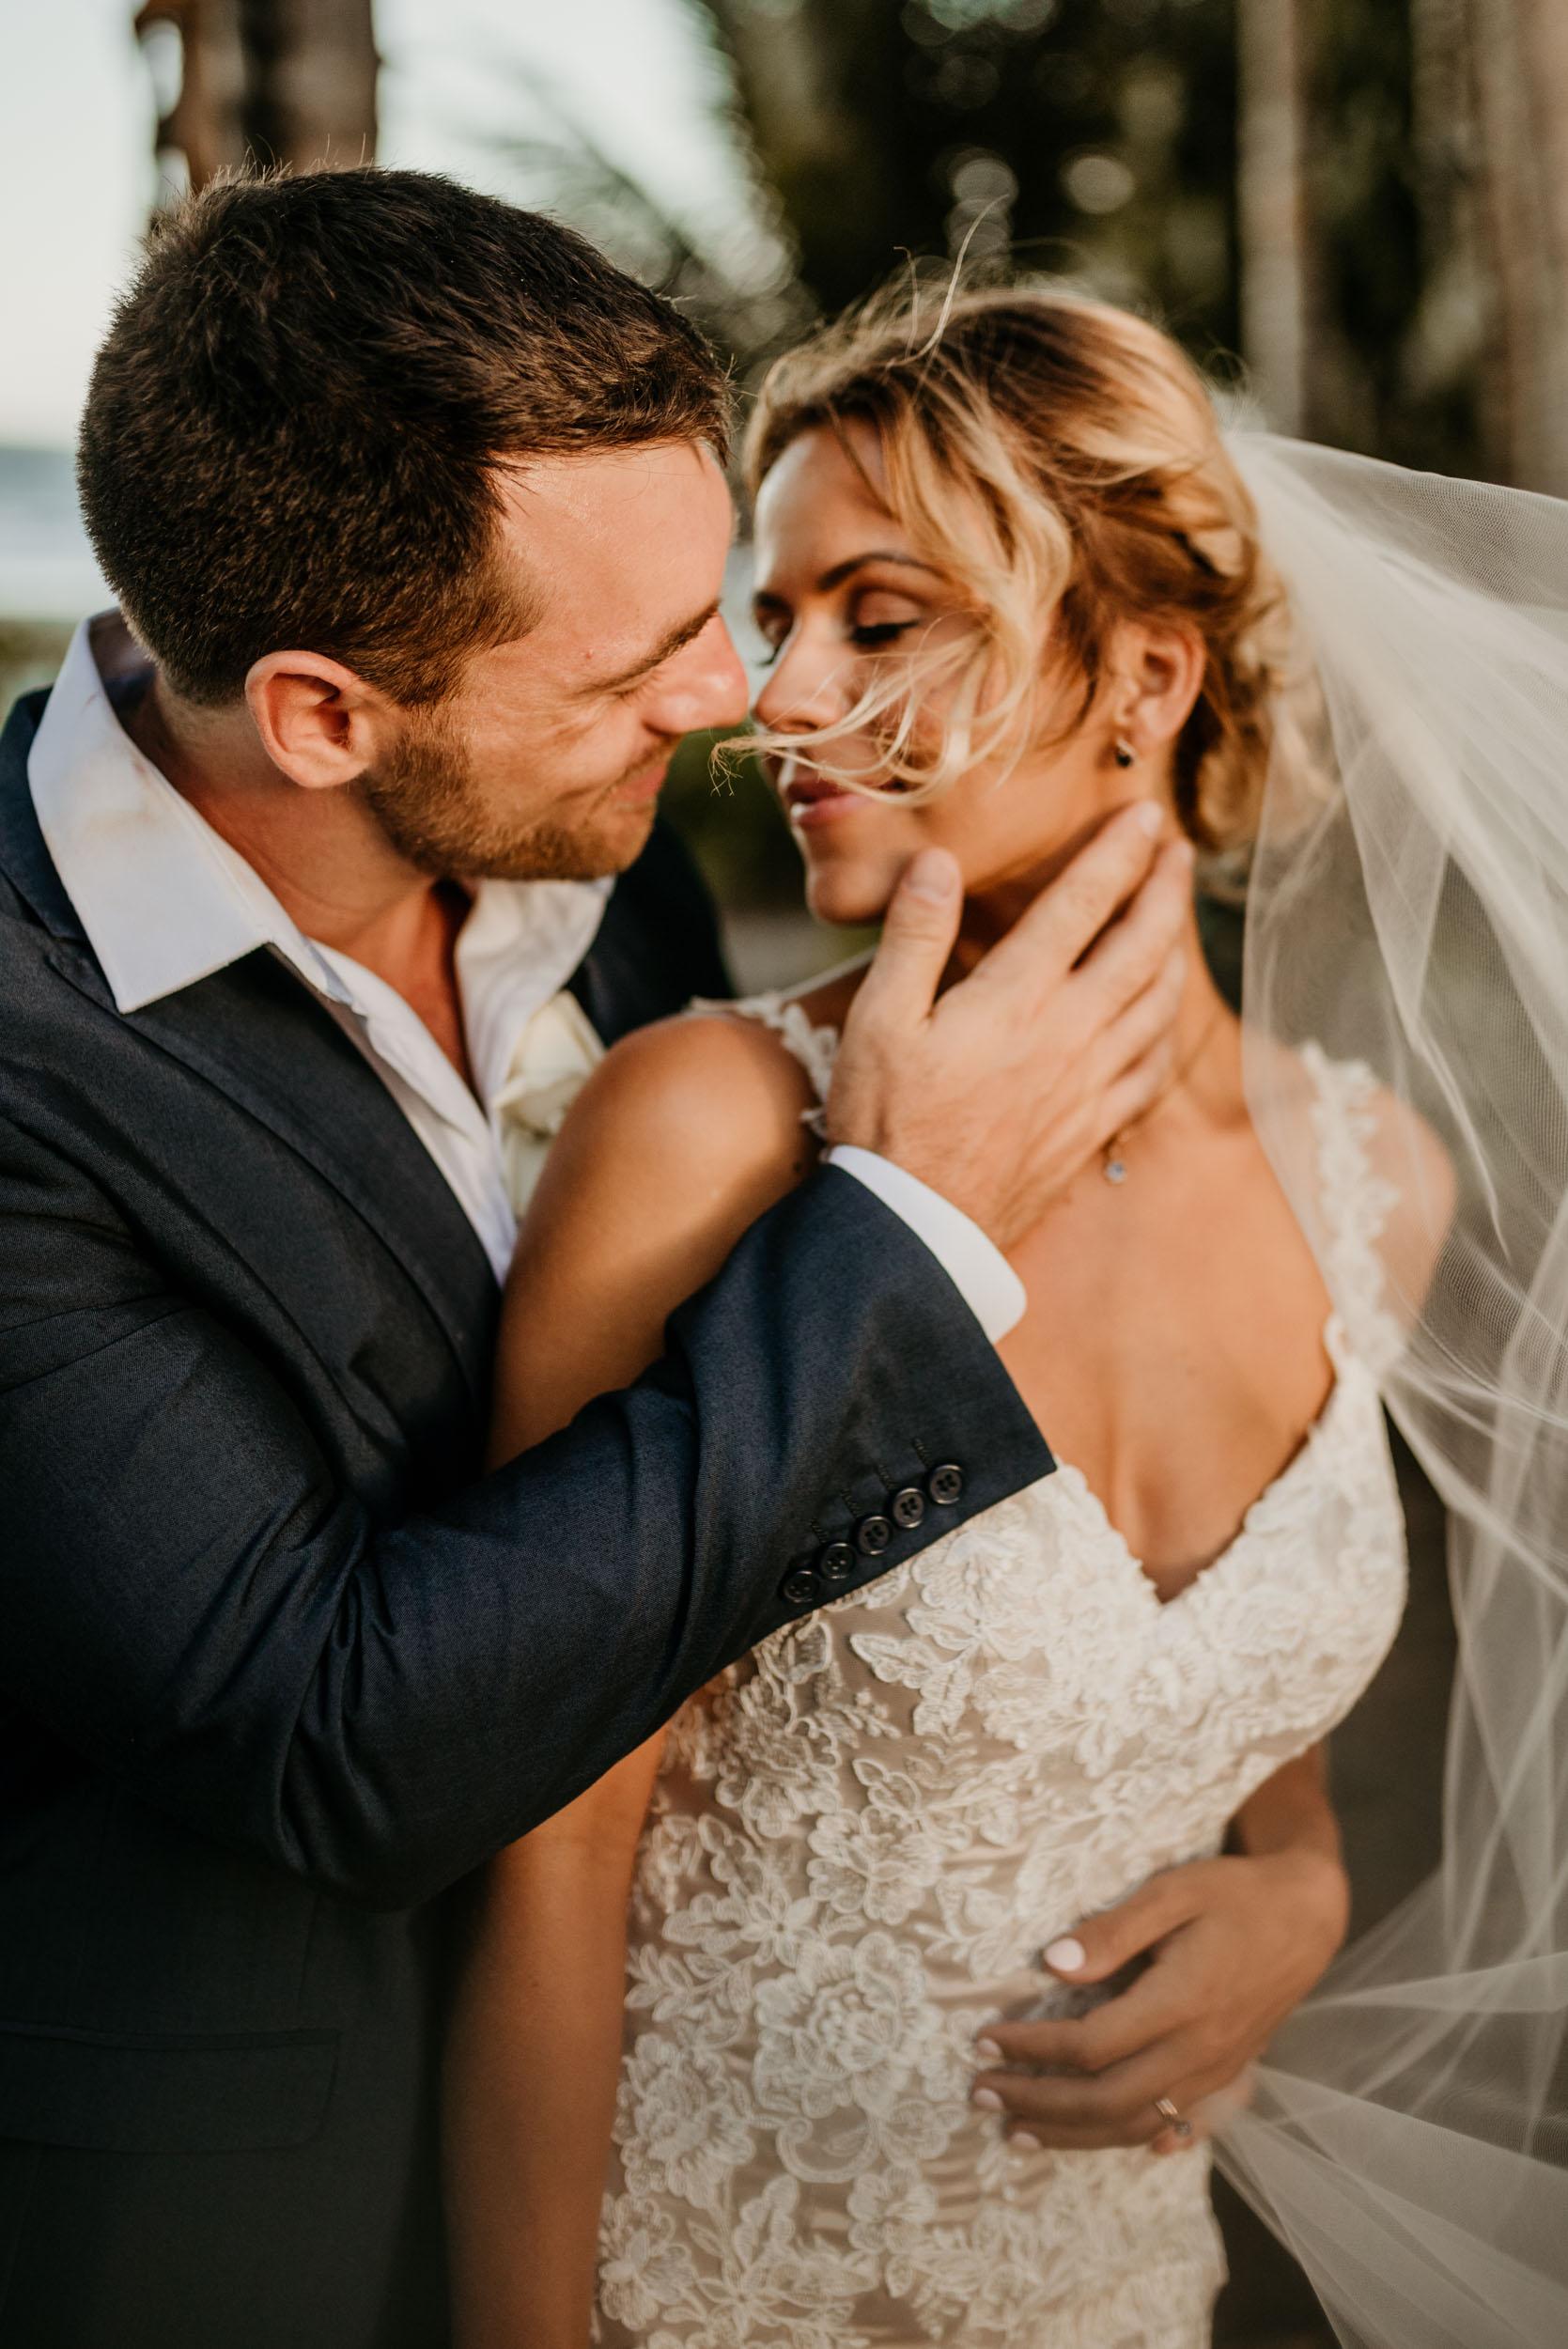 The Raw Photographer - Cairns and Port Douglas Wedding Photographer - Best of 2018-25.jpg